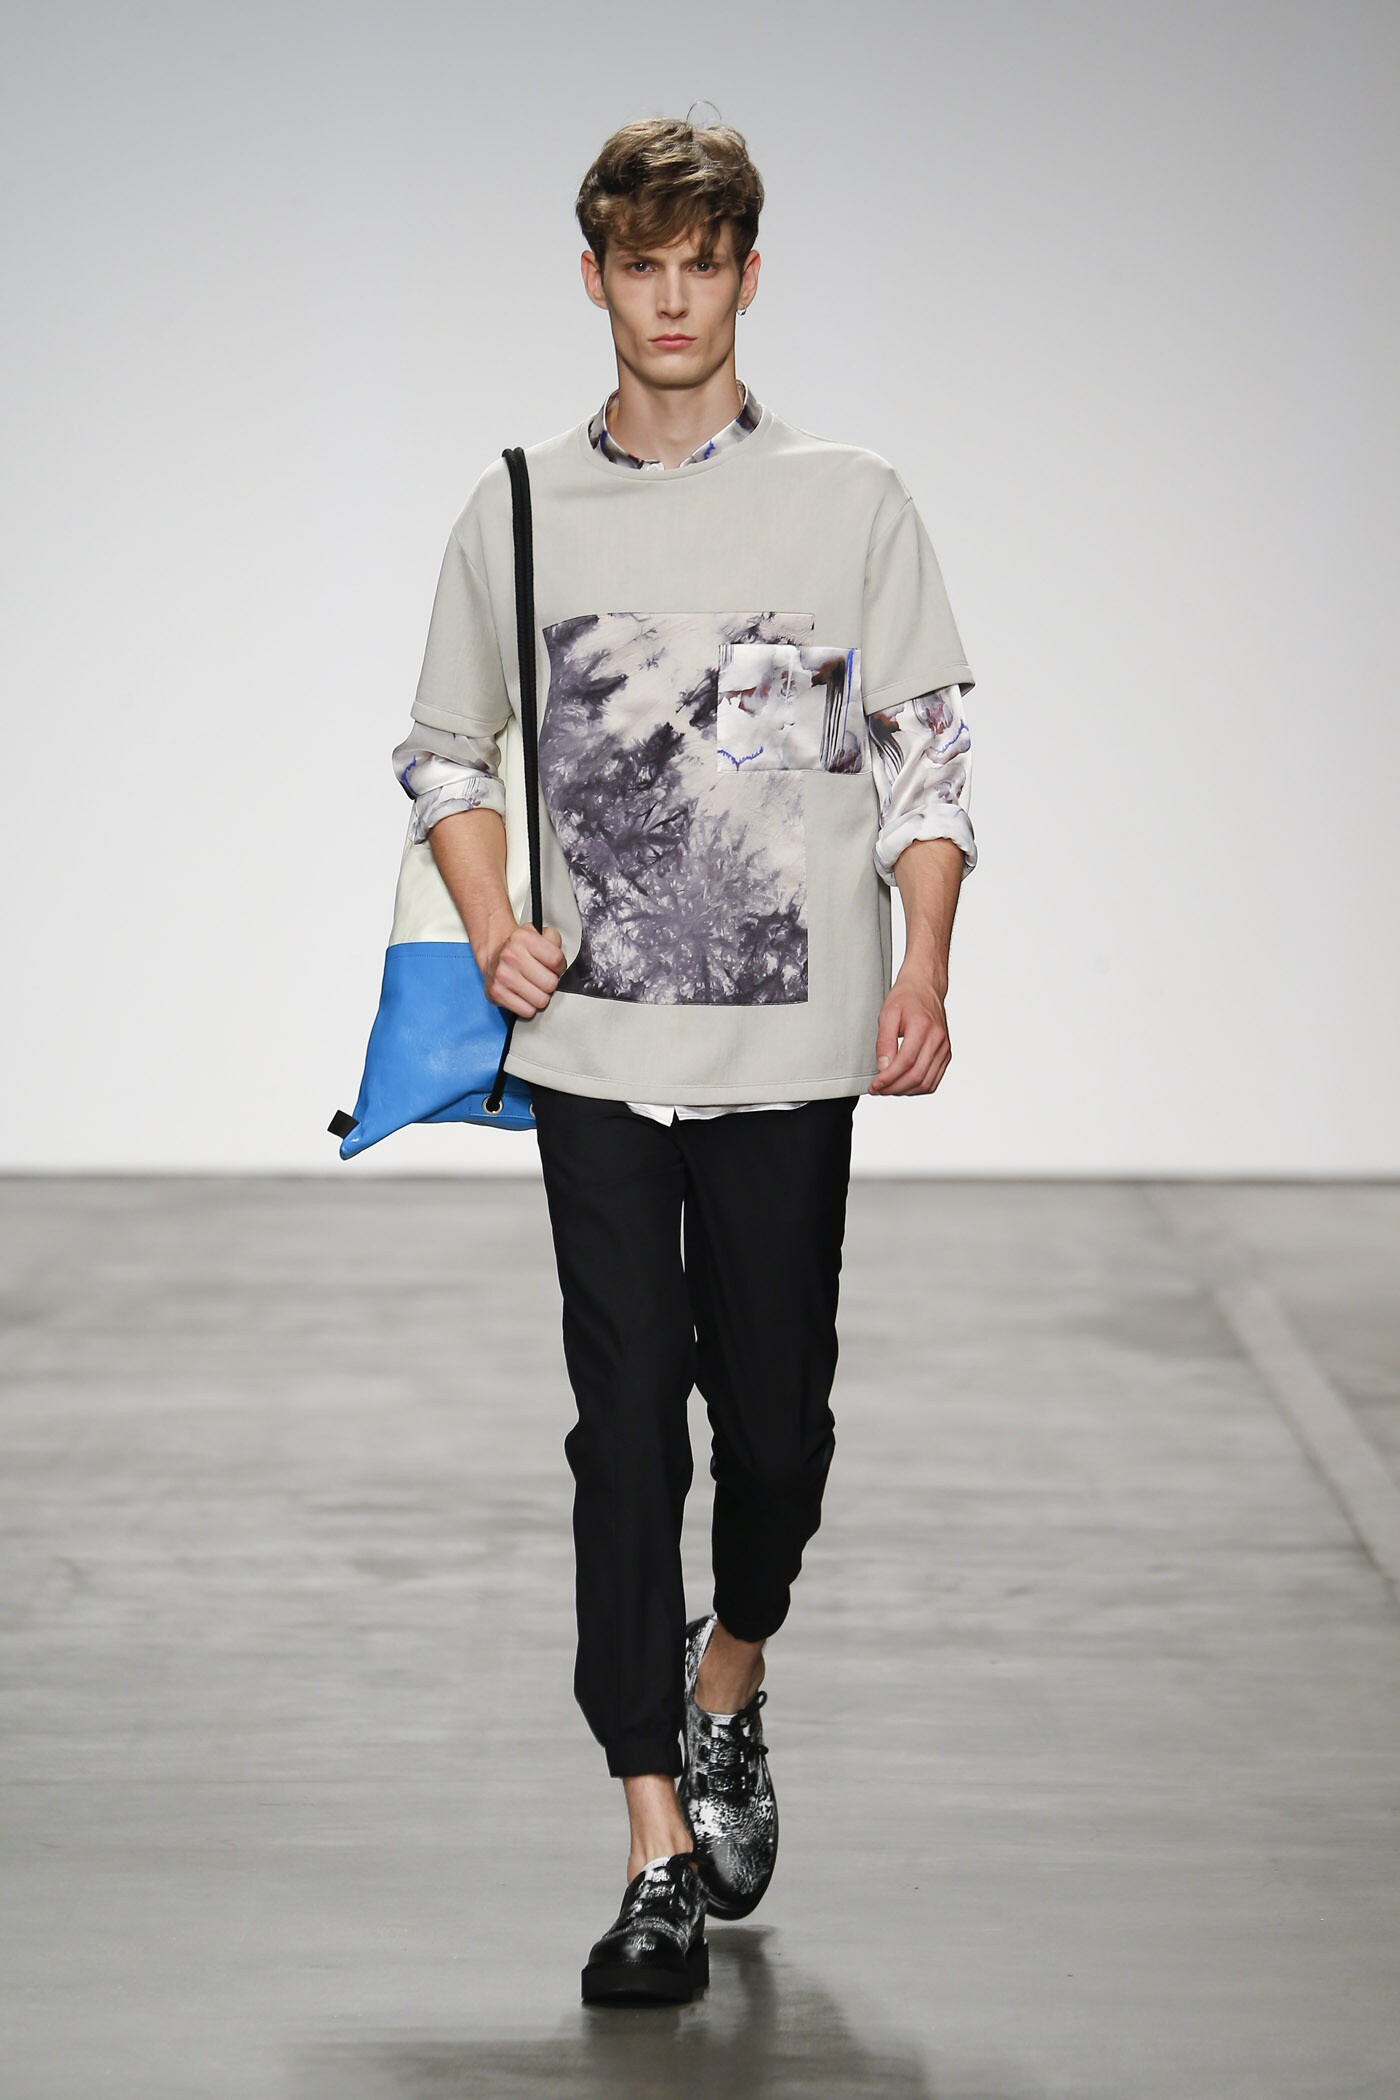 Spring 2015 Man Fashion Show Iceberg